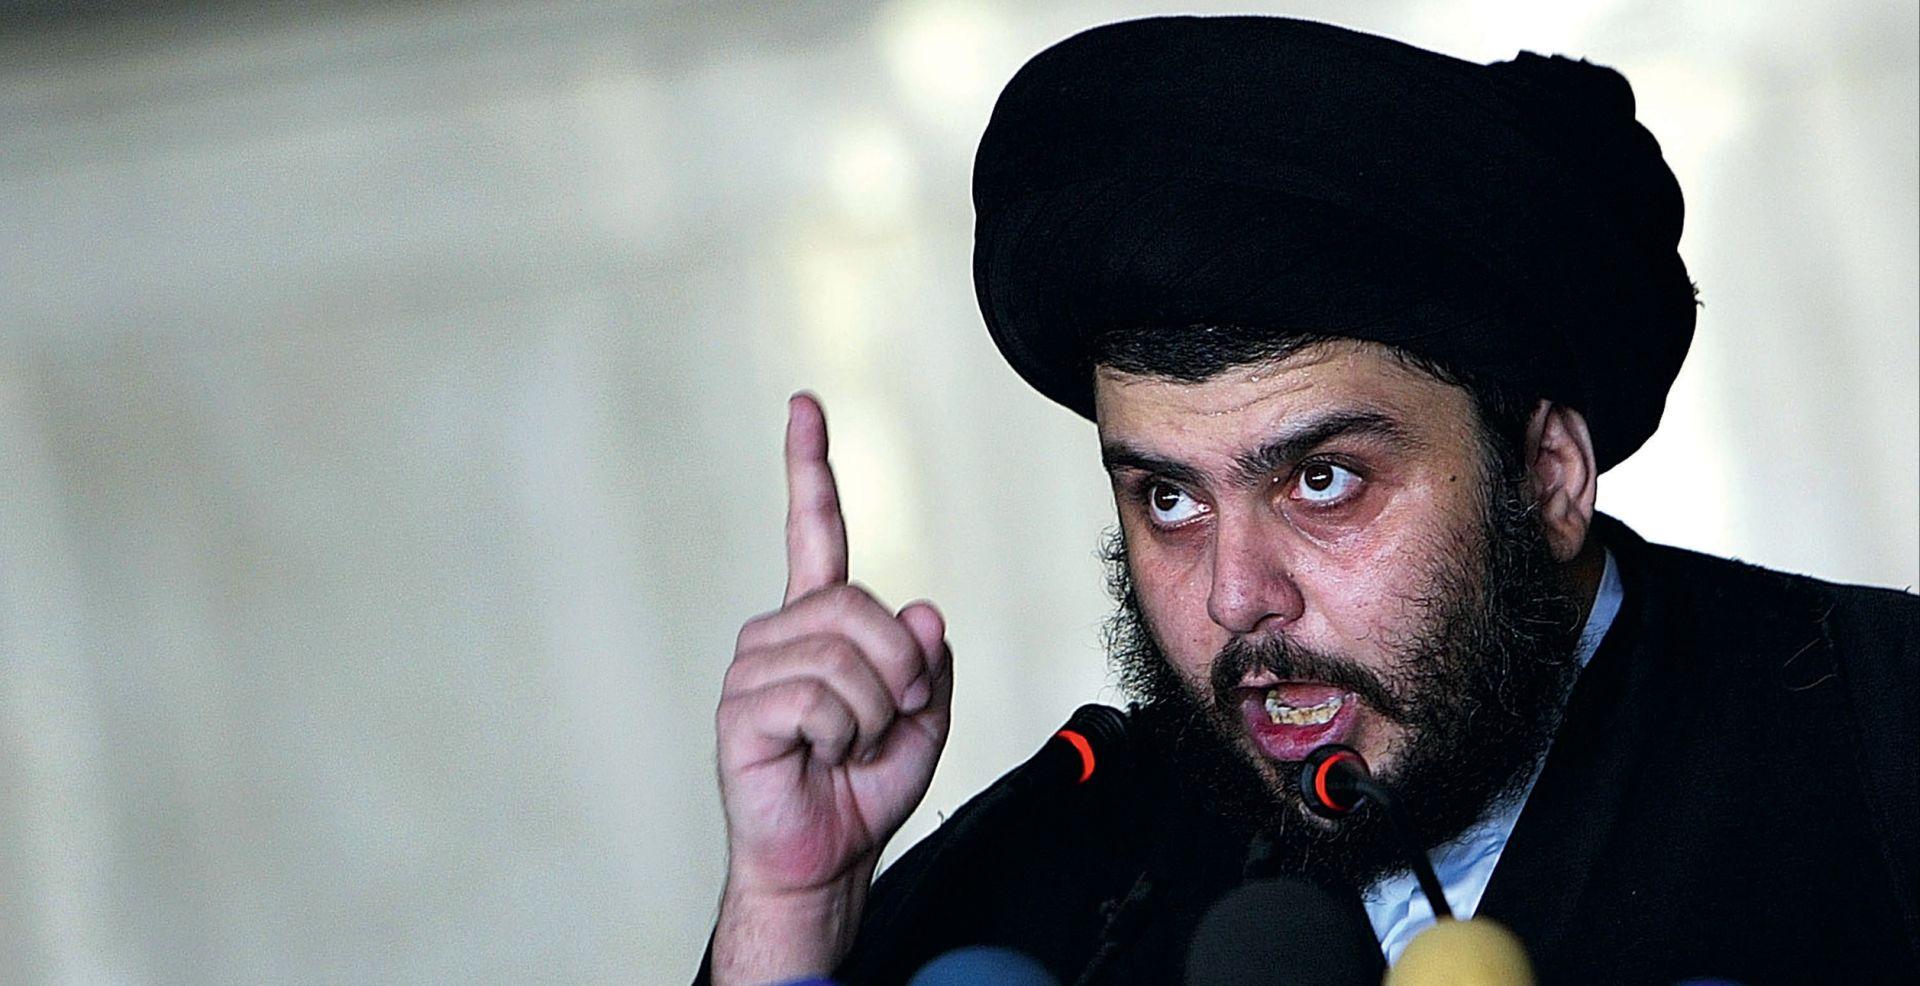 Šijitski sektaški vođa postao borac protiv koruptivne vlade i zagovornik demokratskih procesa u zemlji